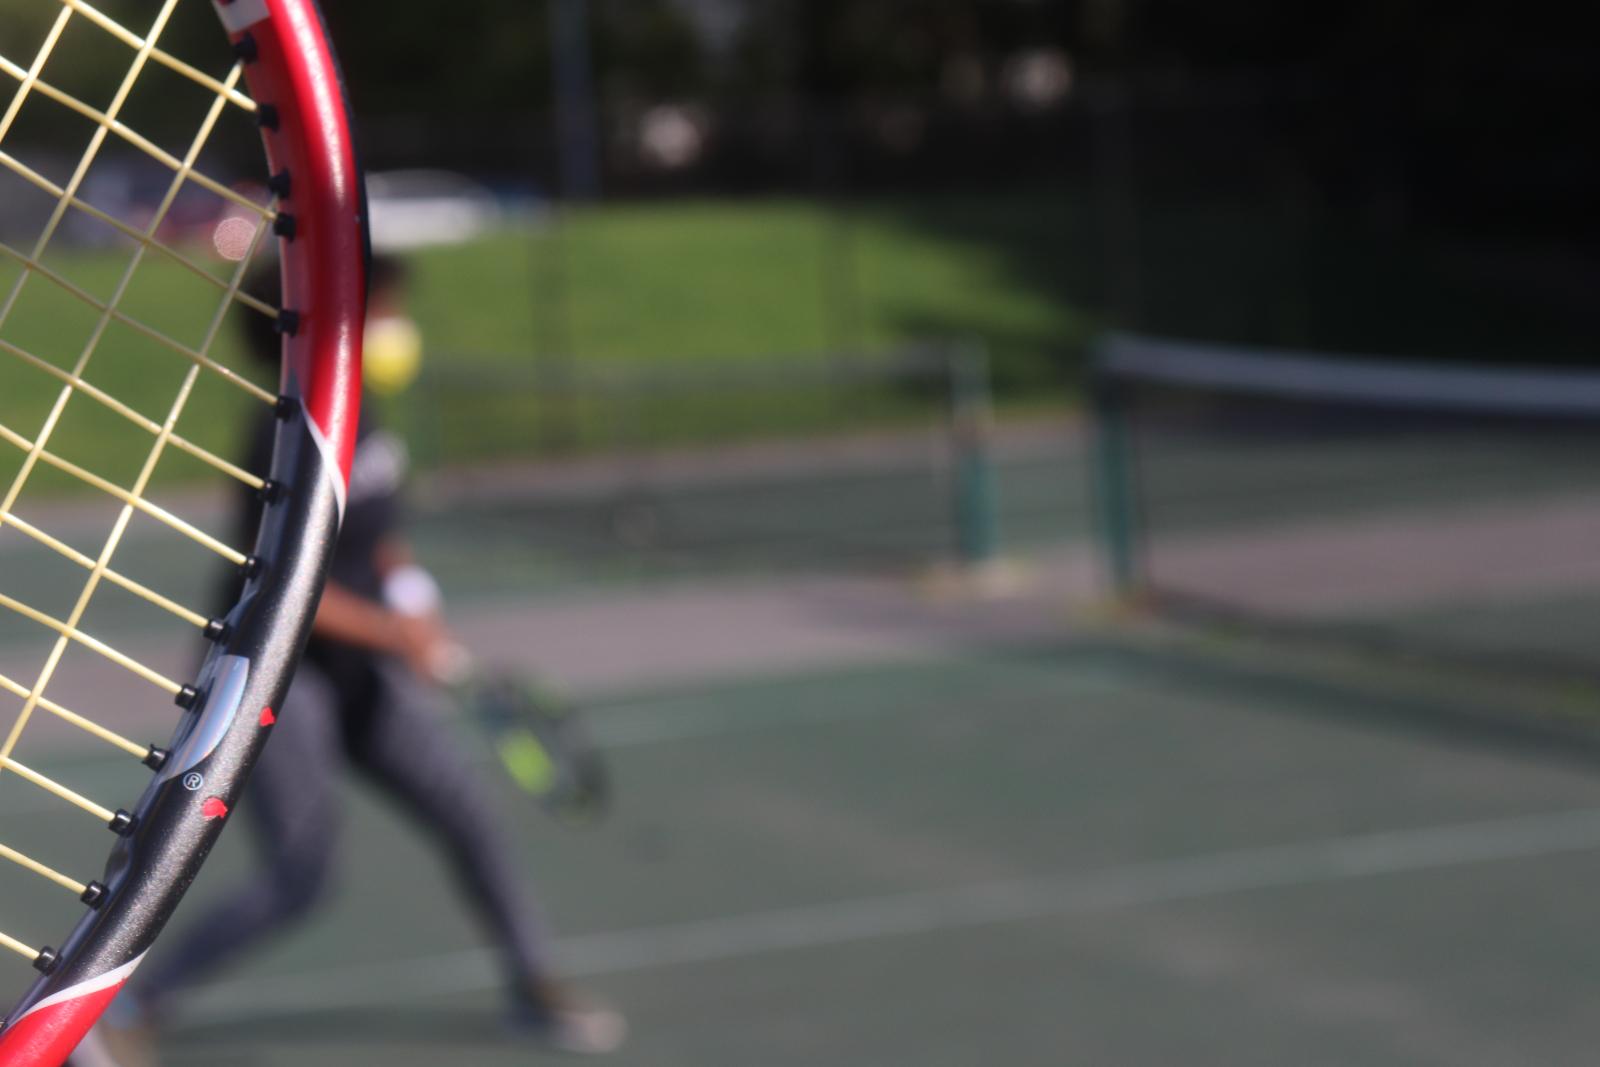 Tennis April 2021 by Virginia Bates